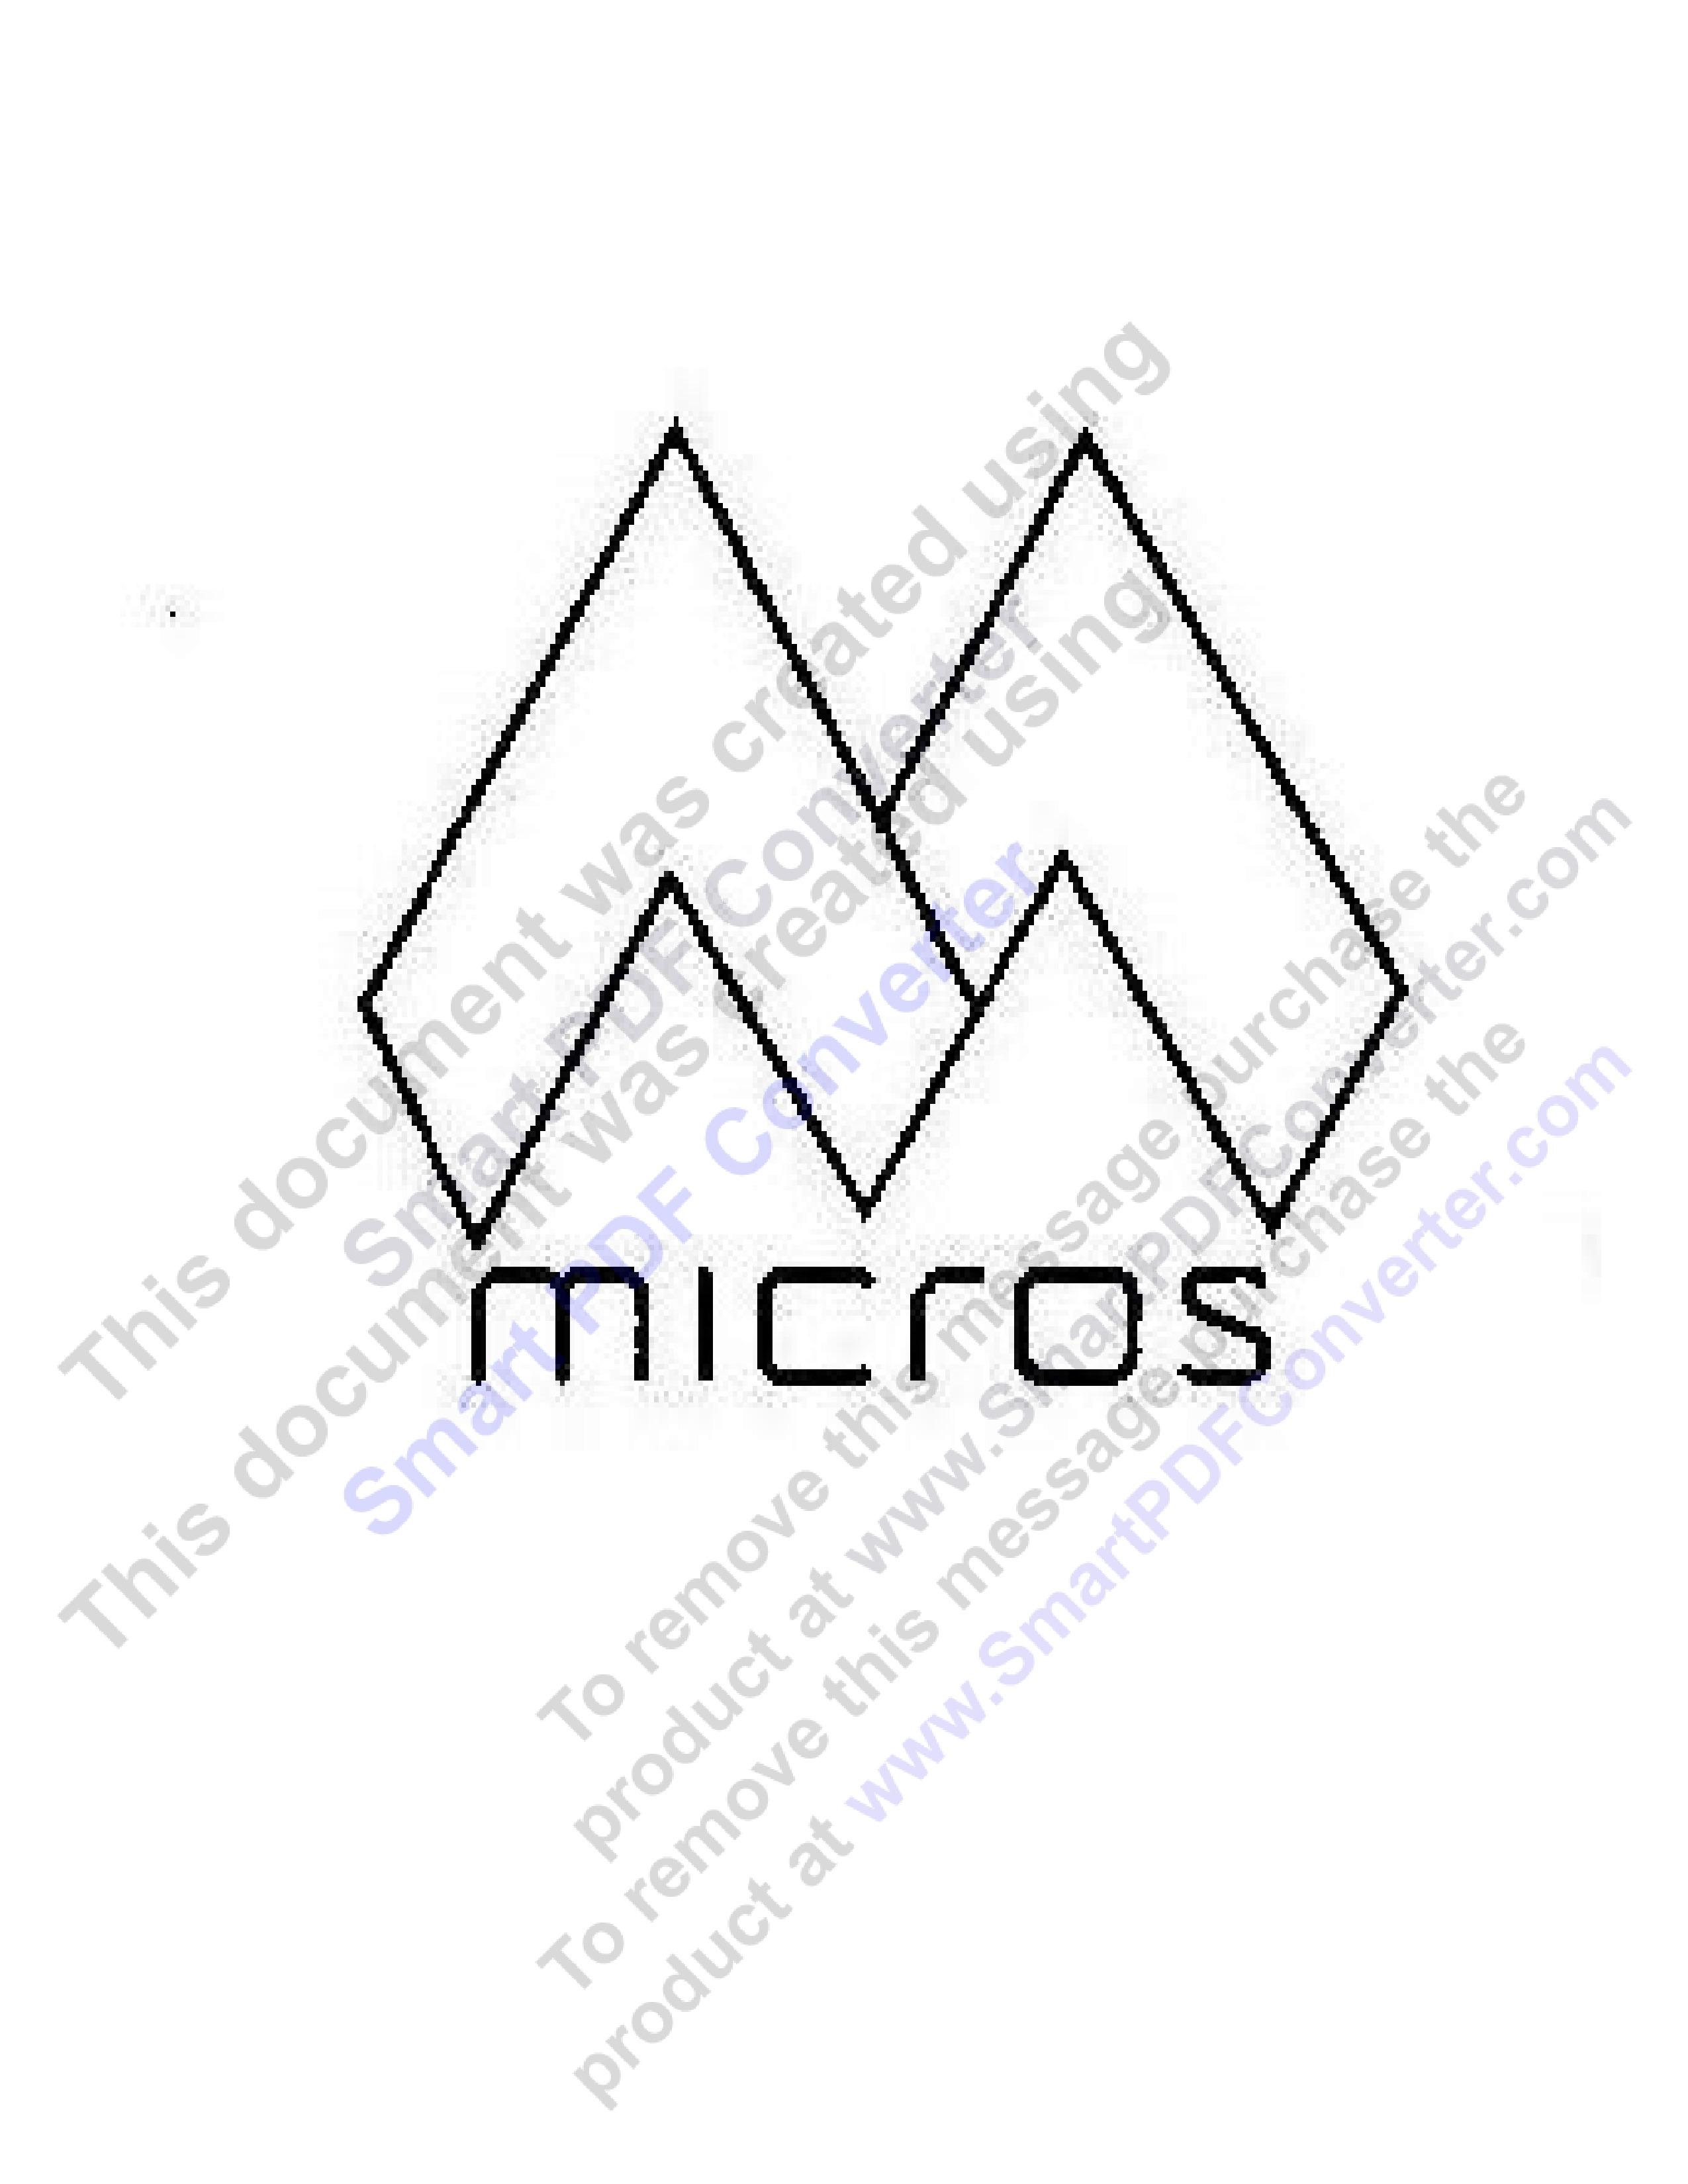 MICROS SUGAR ENGINEERING SOLUTION (P) LTD.